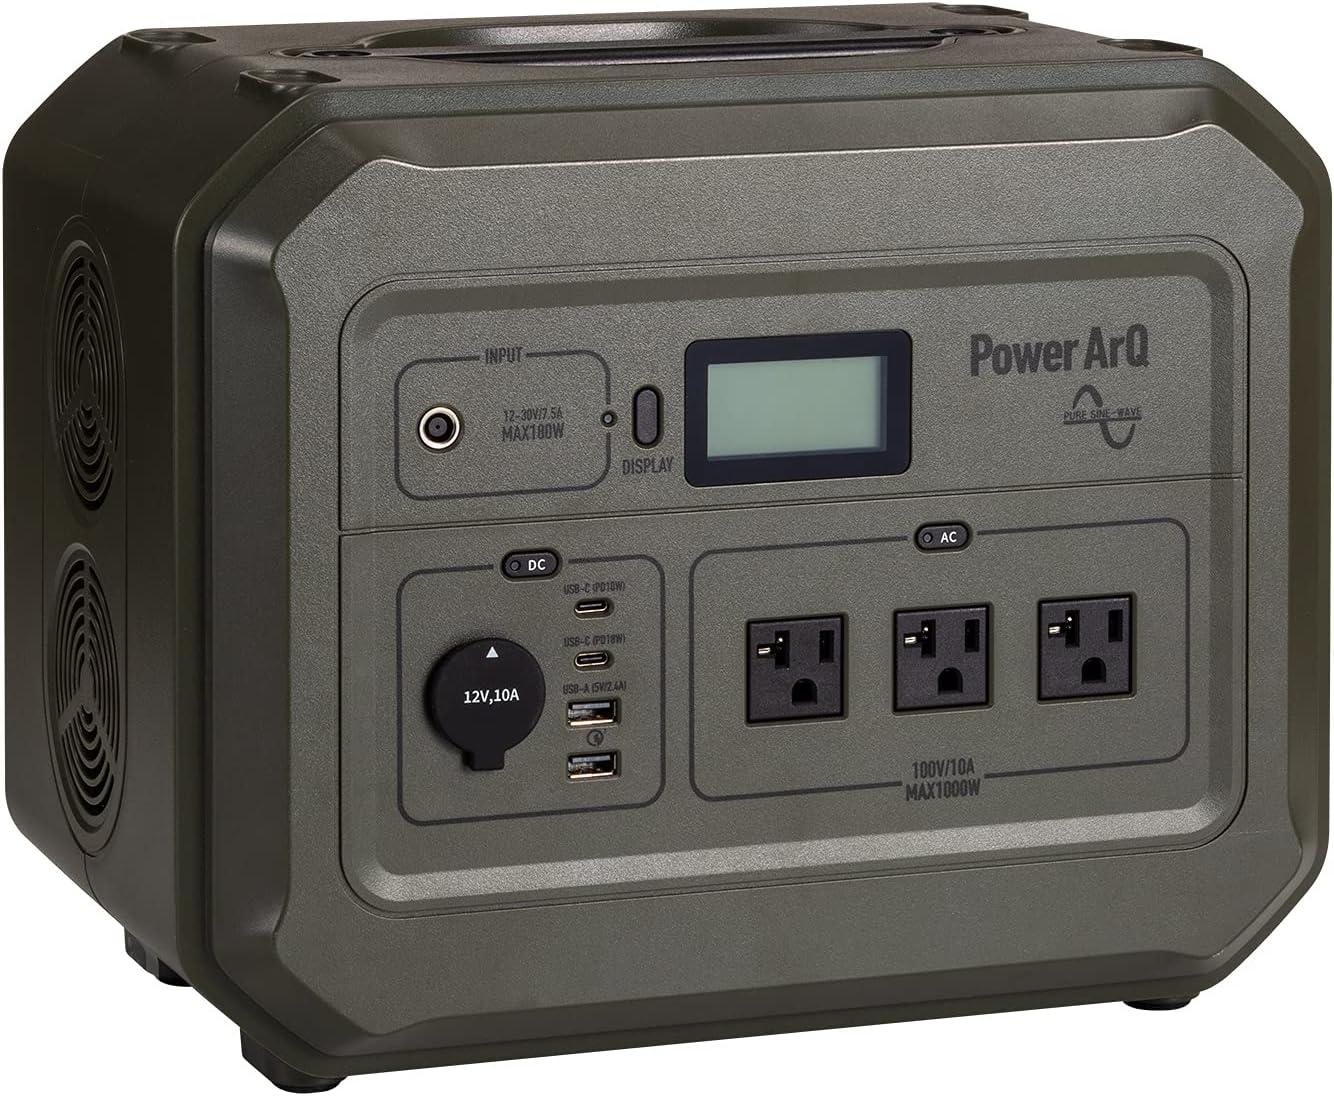 PowerArQ Pro ポータブル電源 大容量 1000Wh 蓄電池 Smart Tap/スマートタップ(Smart Tap)